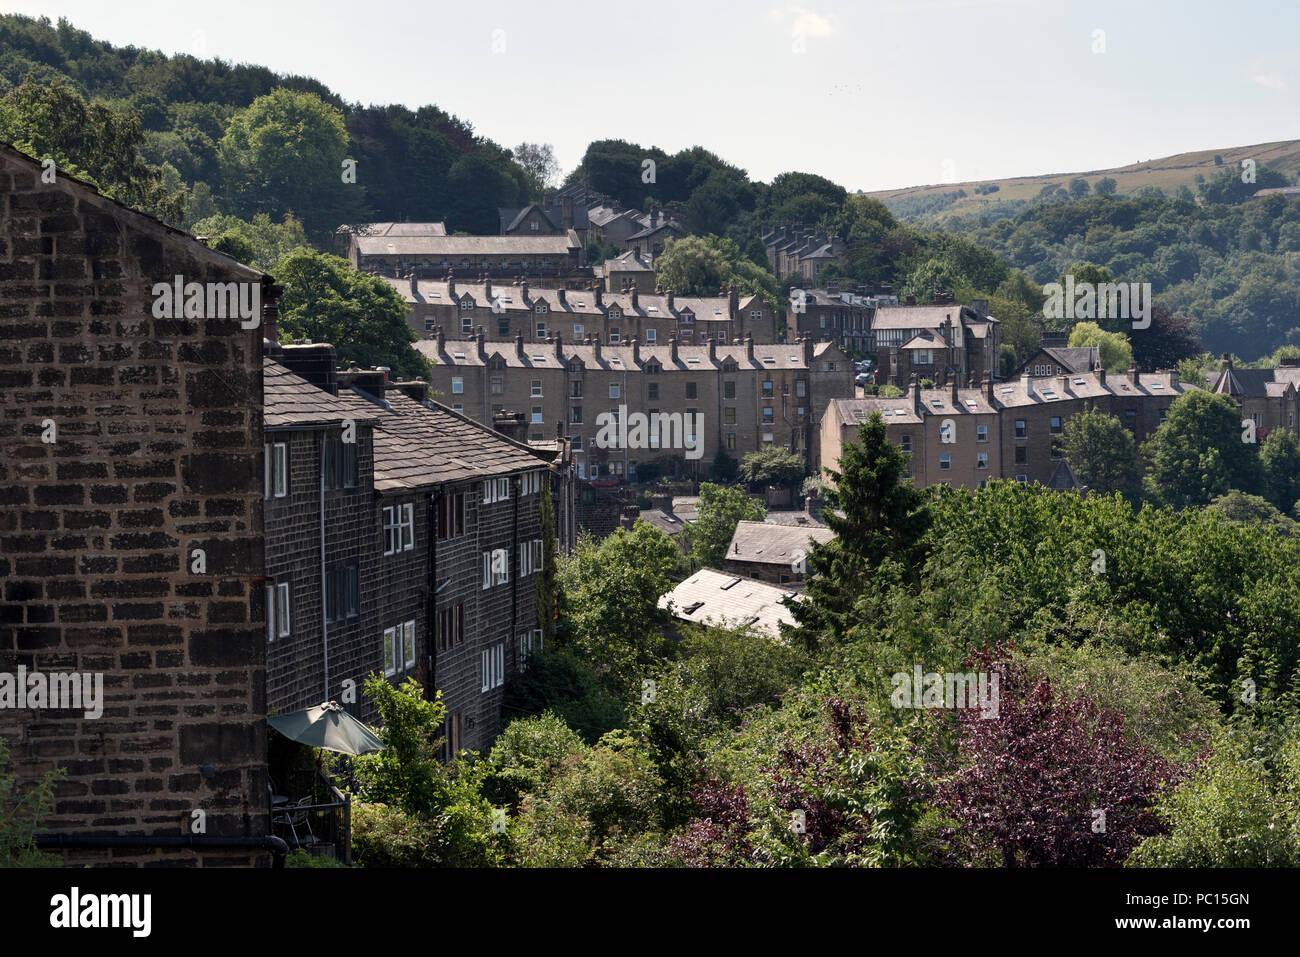 The Pennine town of Hebden Bridge in the Calder Valley, West Yorkshire, UK - Stock Image